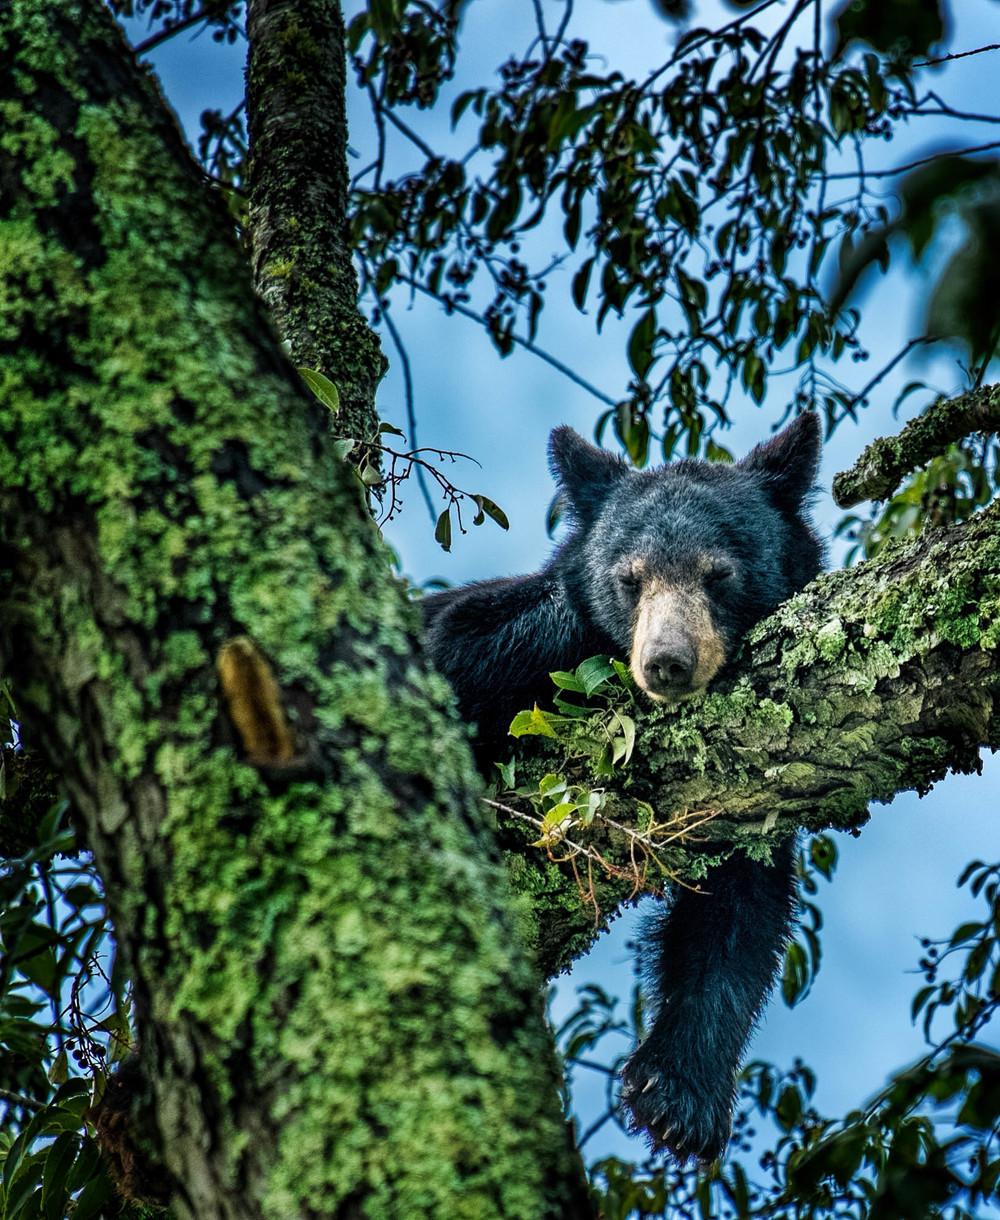 Black bear in the tree